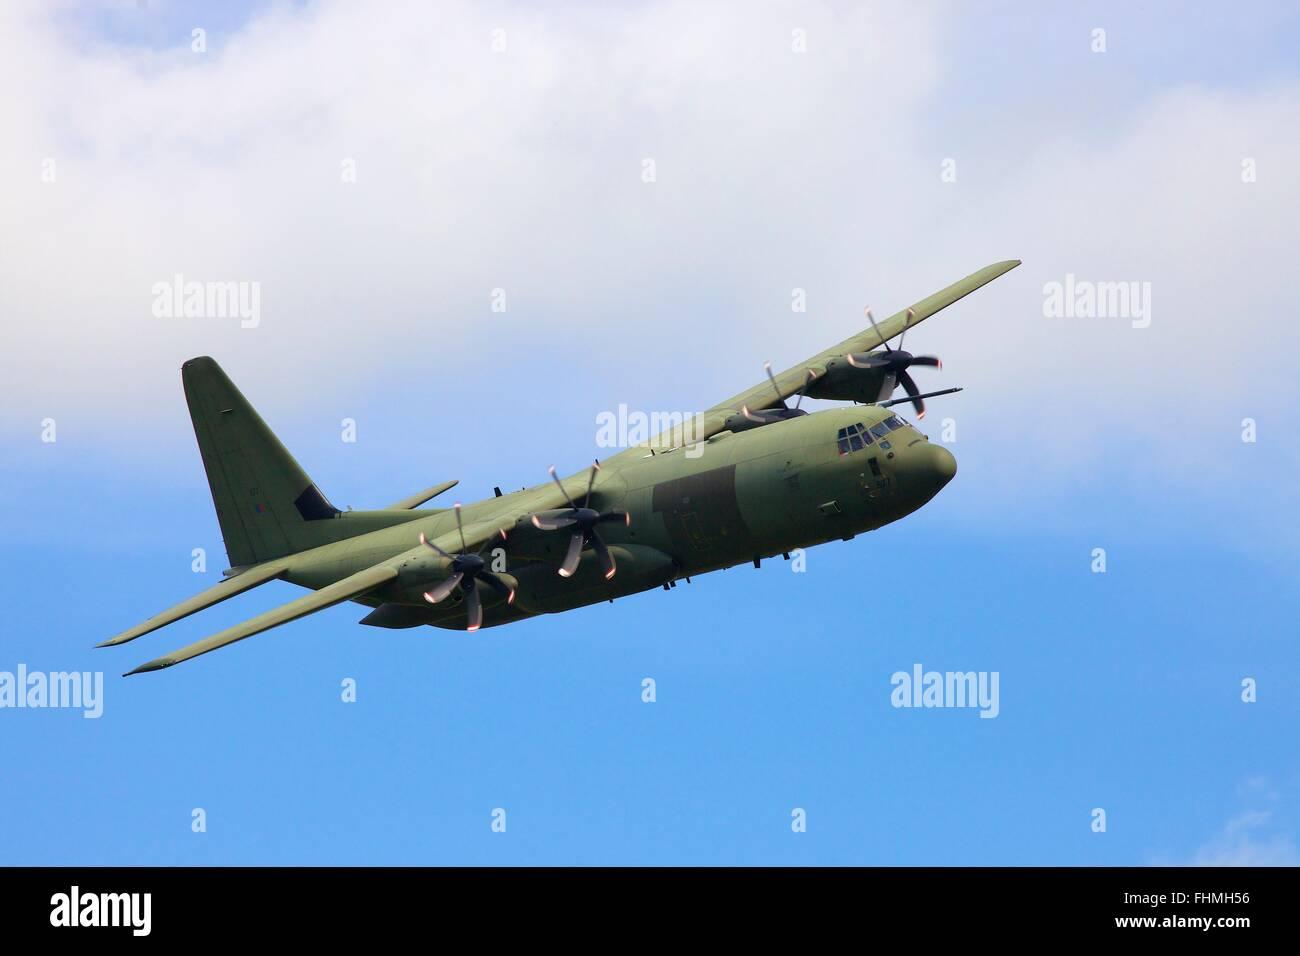 Lockheed C-130 Hercules four-engine turboprop military transport aircraft. - Stock Image